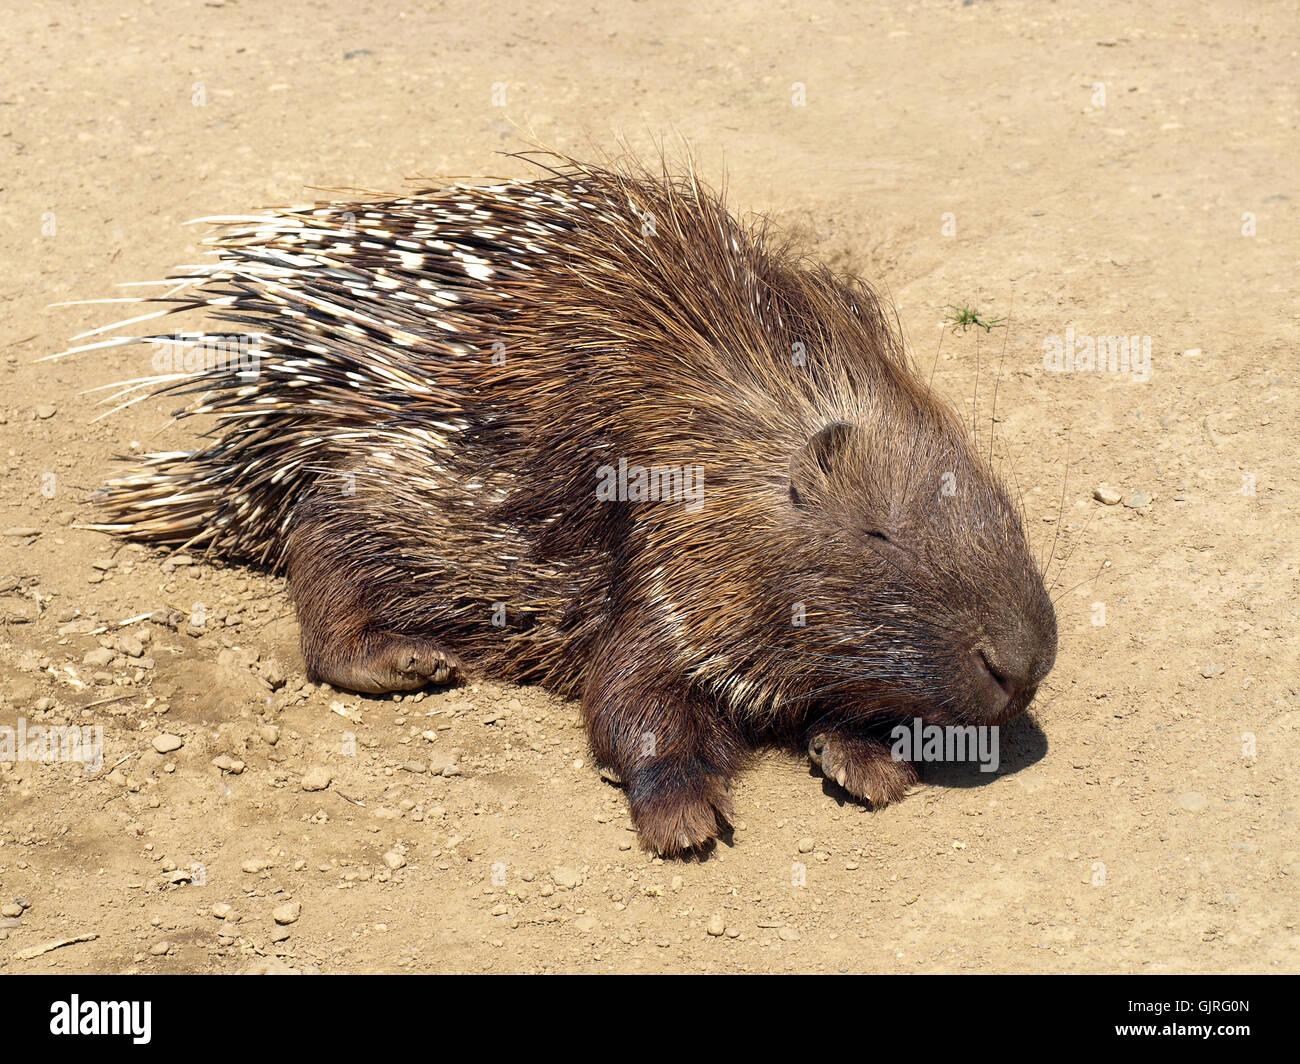 white-tailed porcupine - Stock Image